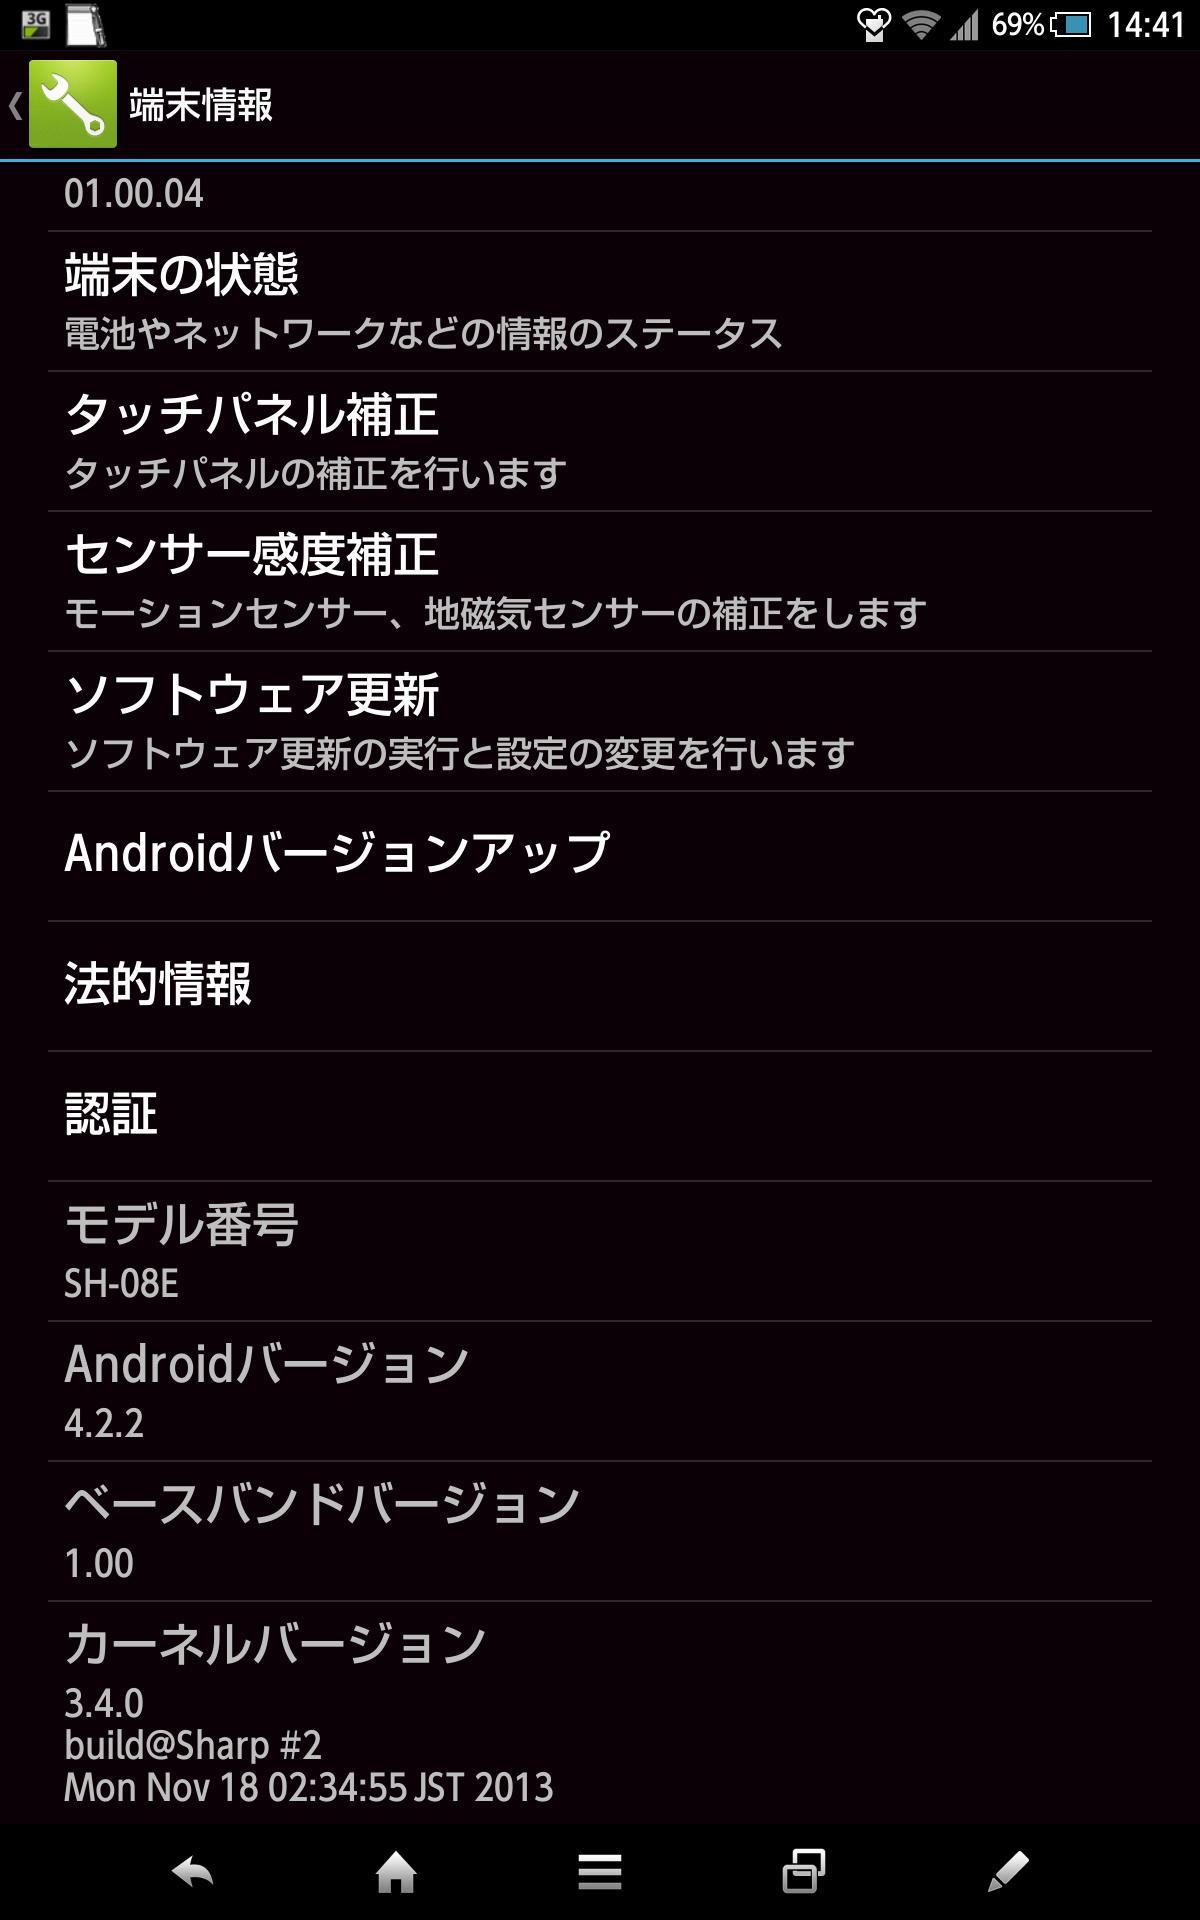 Screenshot_2015-05-25-14-42-01.png